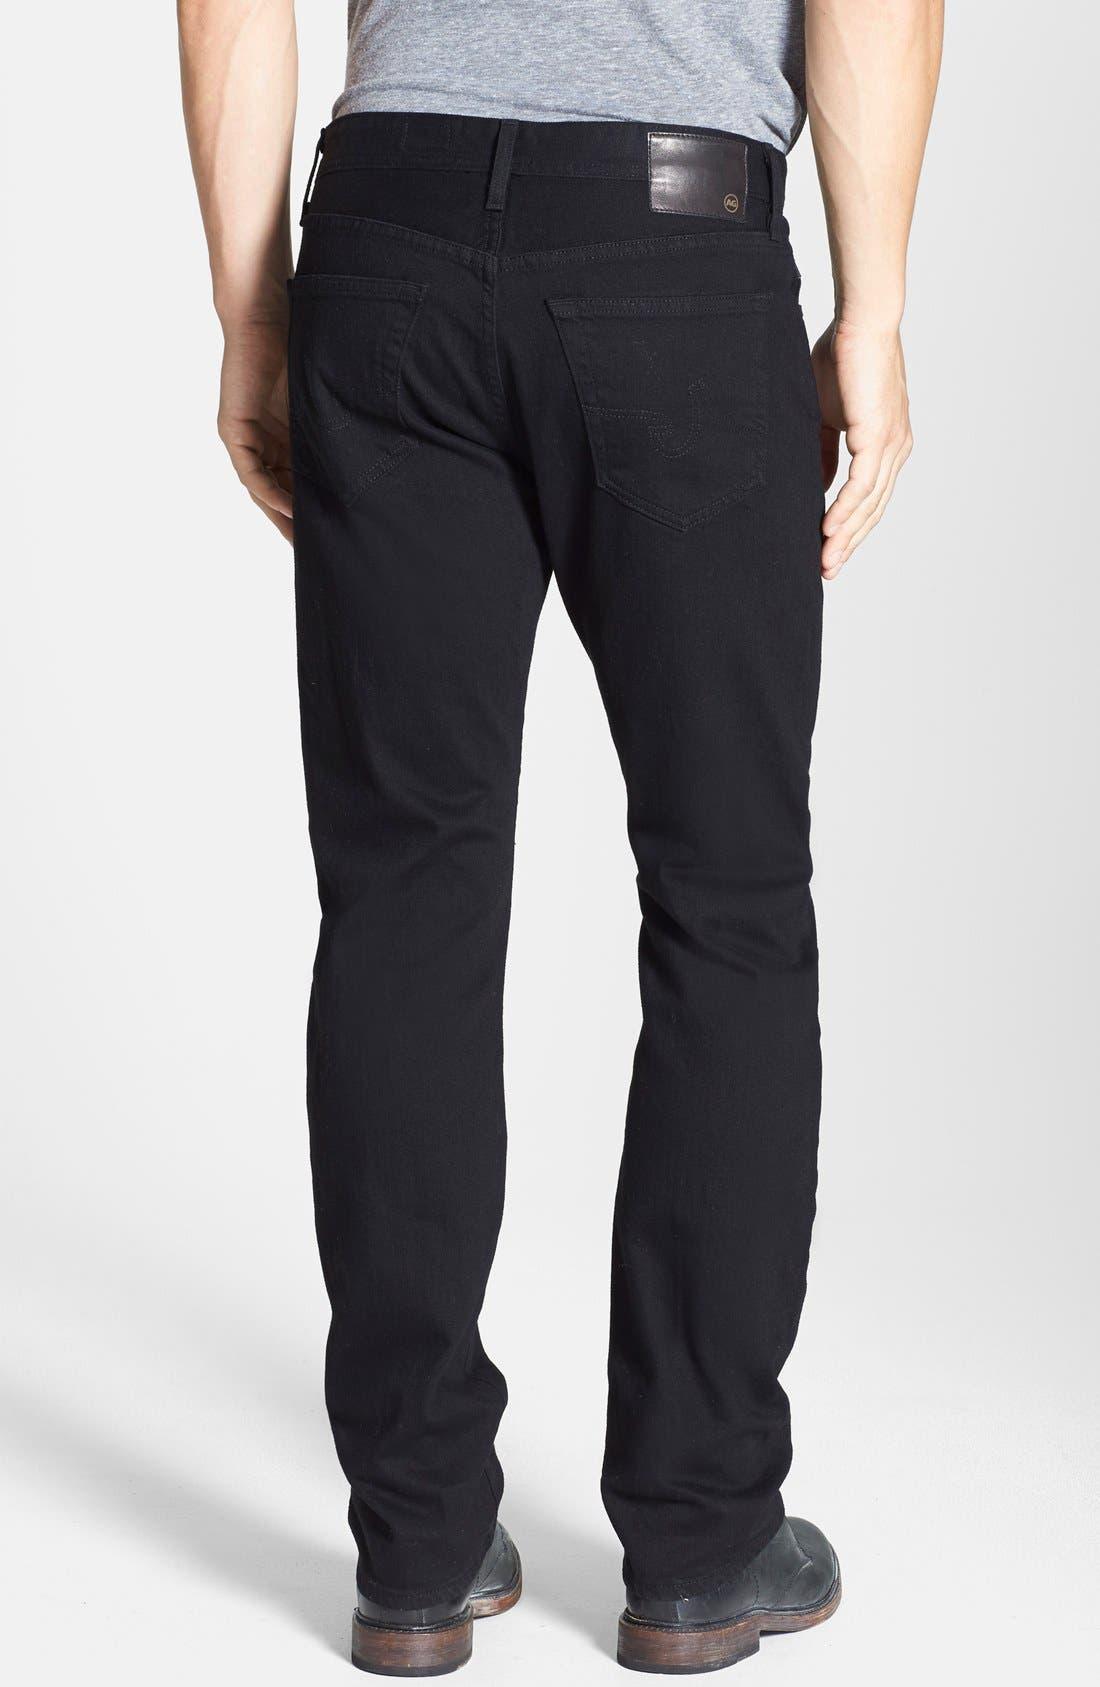 Ag For Men Pants Shirts More Clothing Nordstrom 10 Jeans Lover